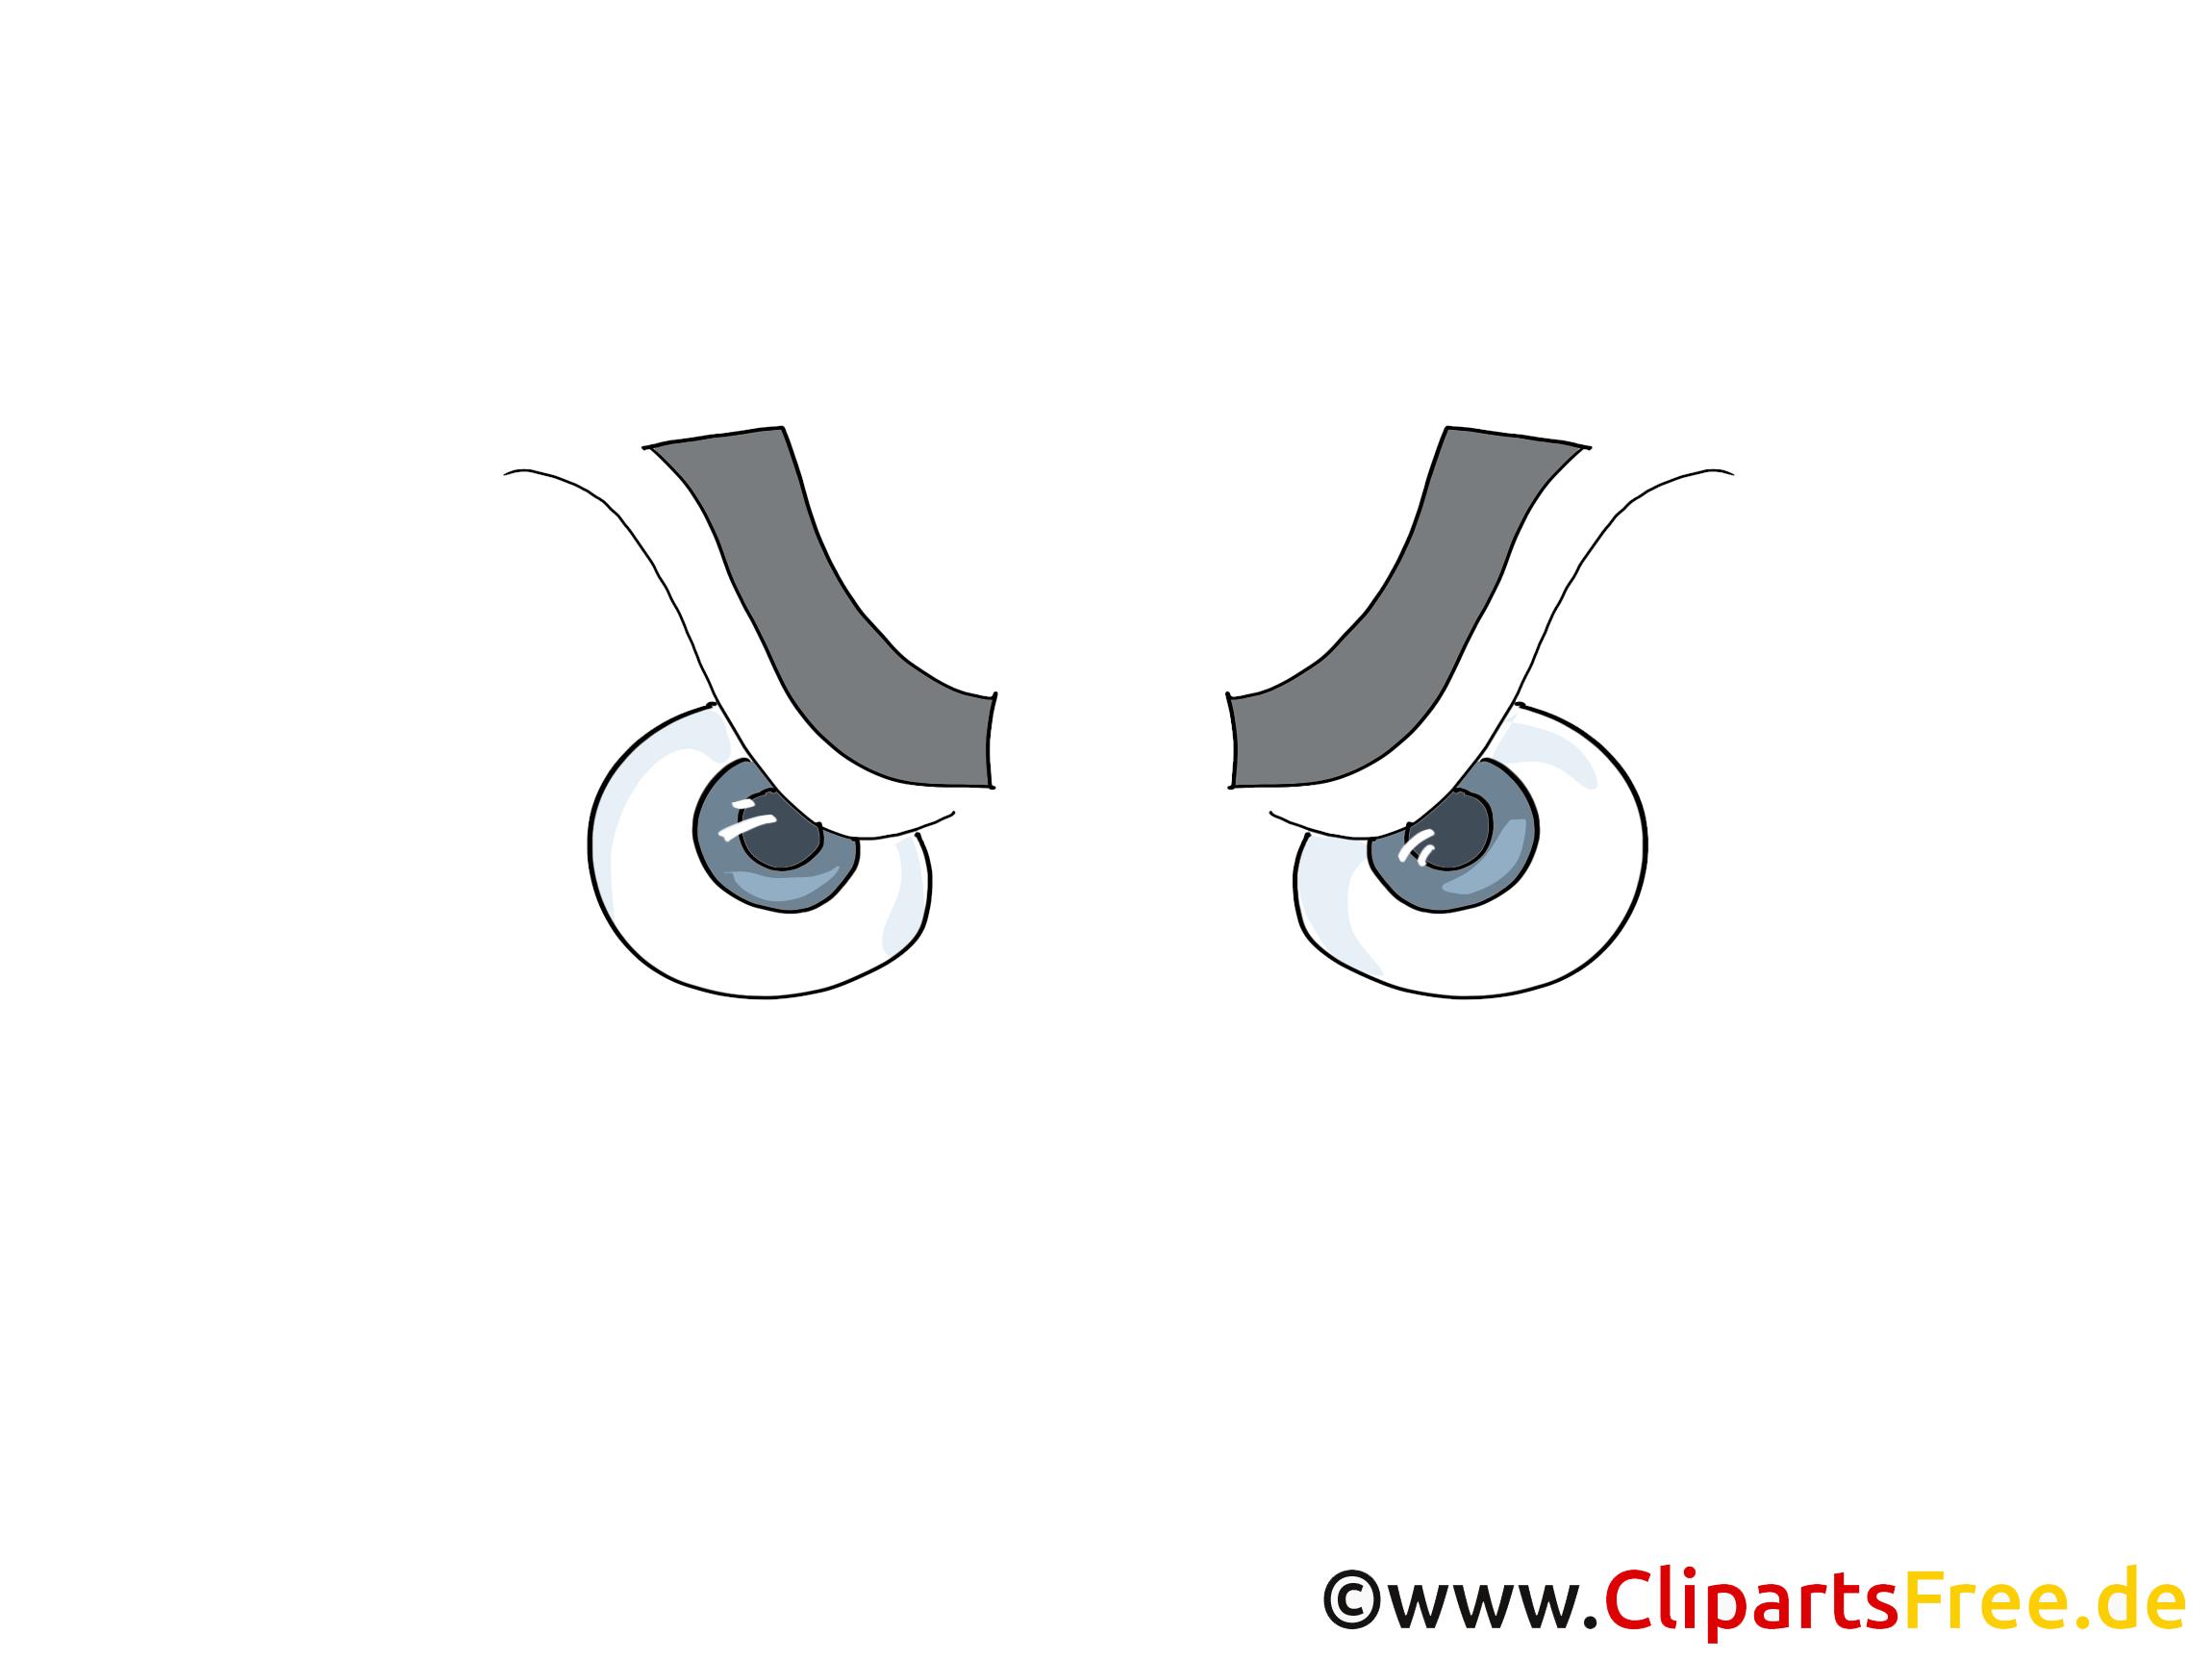 Boeser Blick Zeichnung, Comic, Cartoon